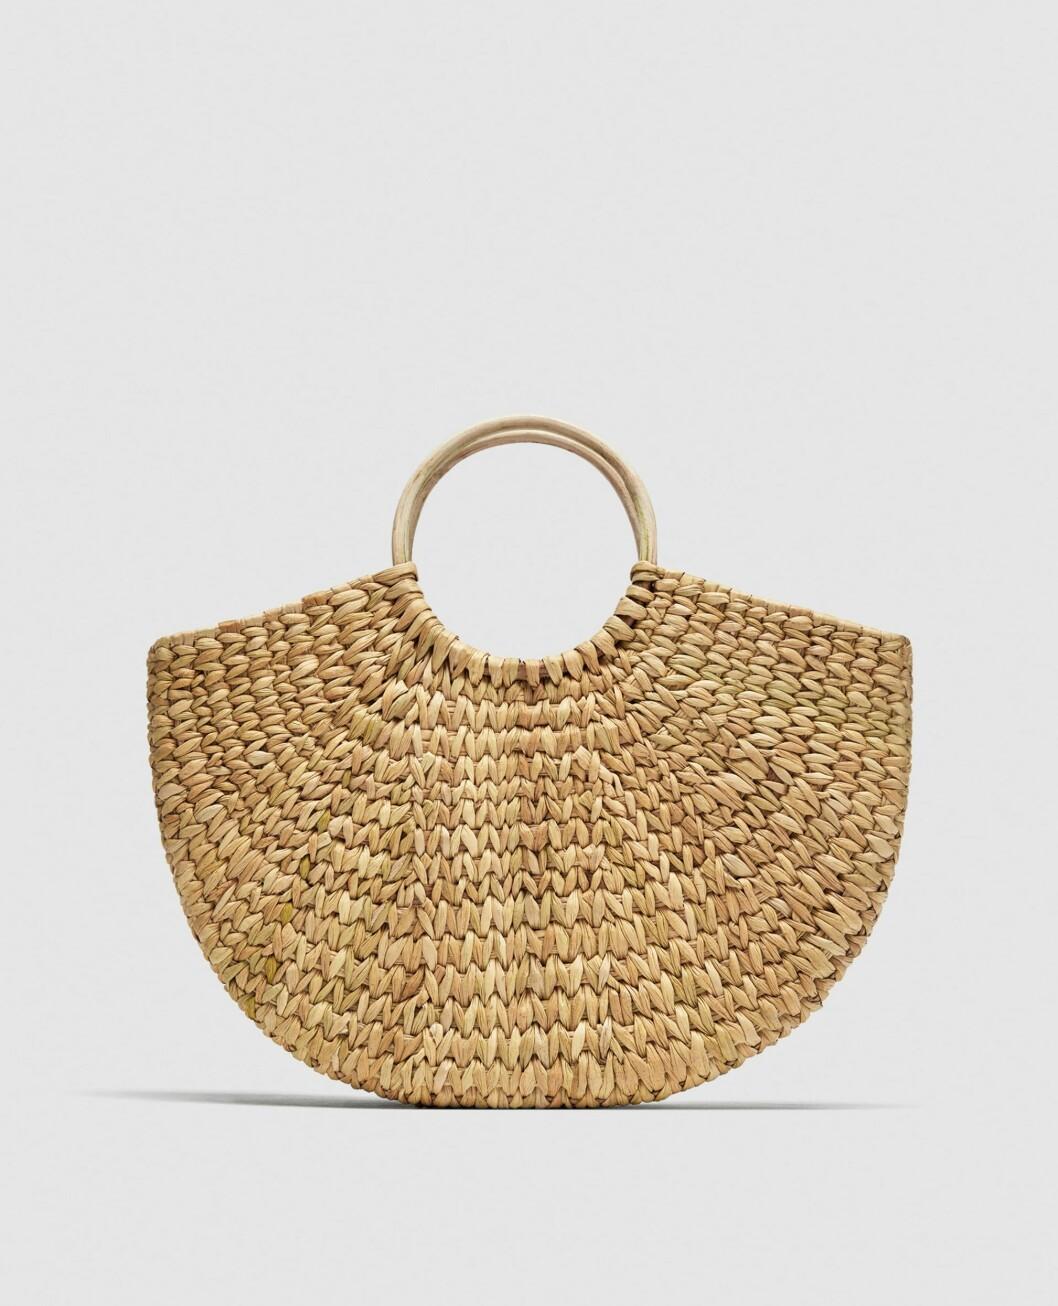 <strong>Vesle med rundt håndtak fra Zara |399,-| https:</strong>//www.zara.com/no/no/handlekurv-med-runde-h%C3%A5ndtak-p12050304.html?v1=5336012&v2=819022